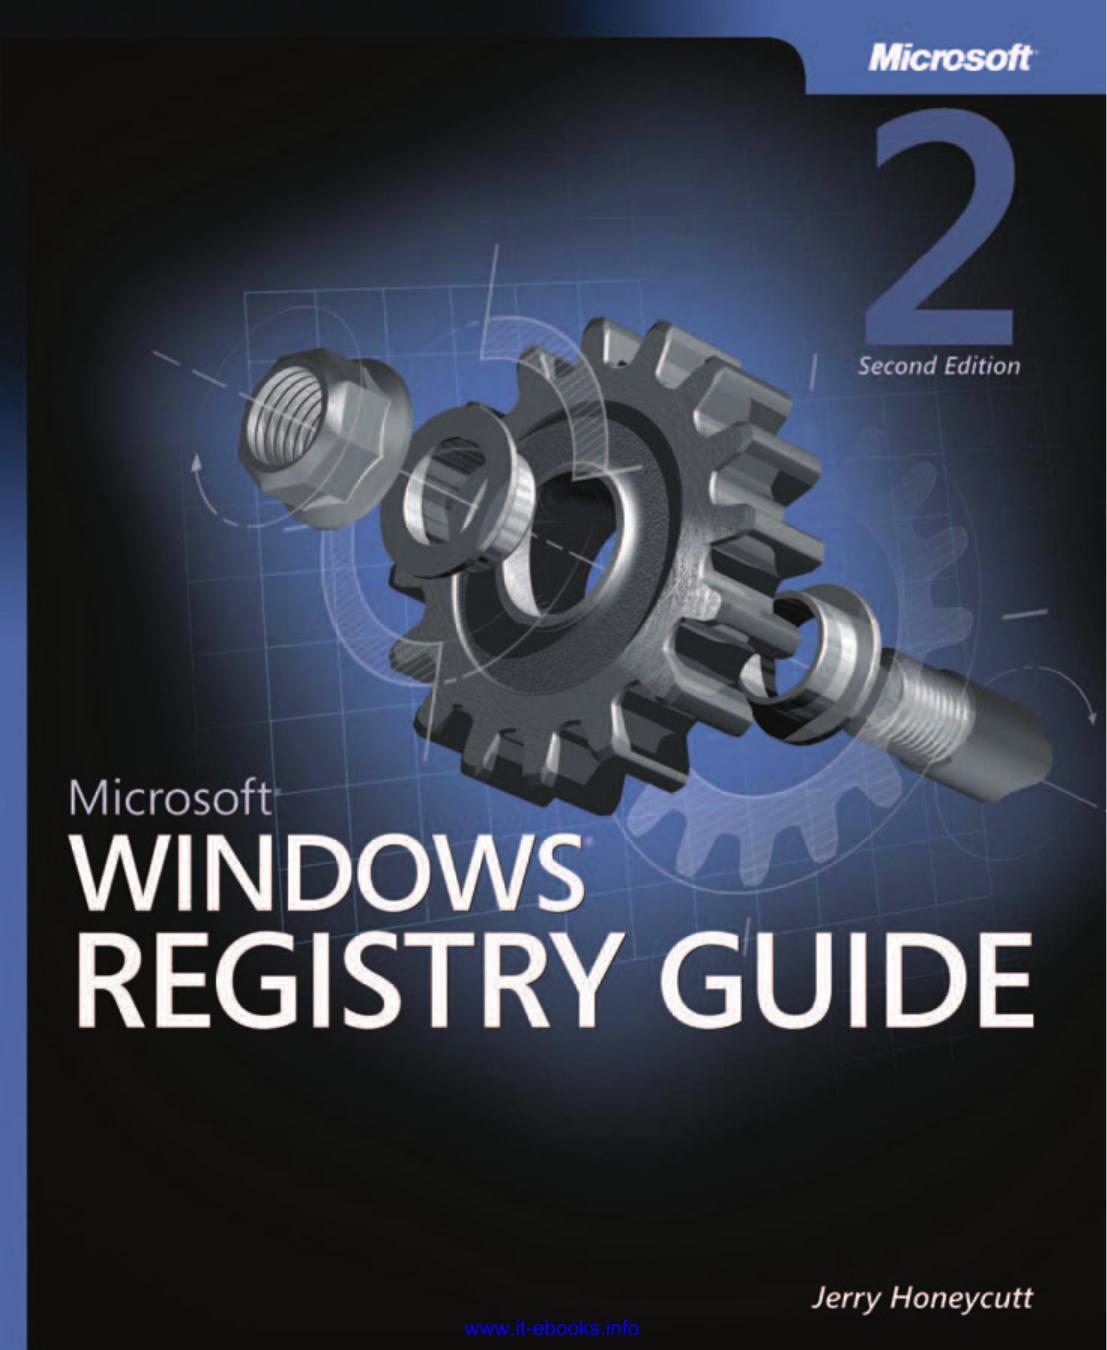 Microsoft Windows Registry Guide 2nd Edition | manualzz com